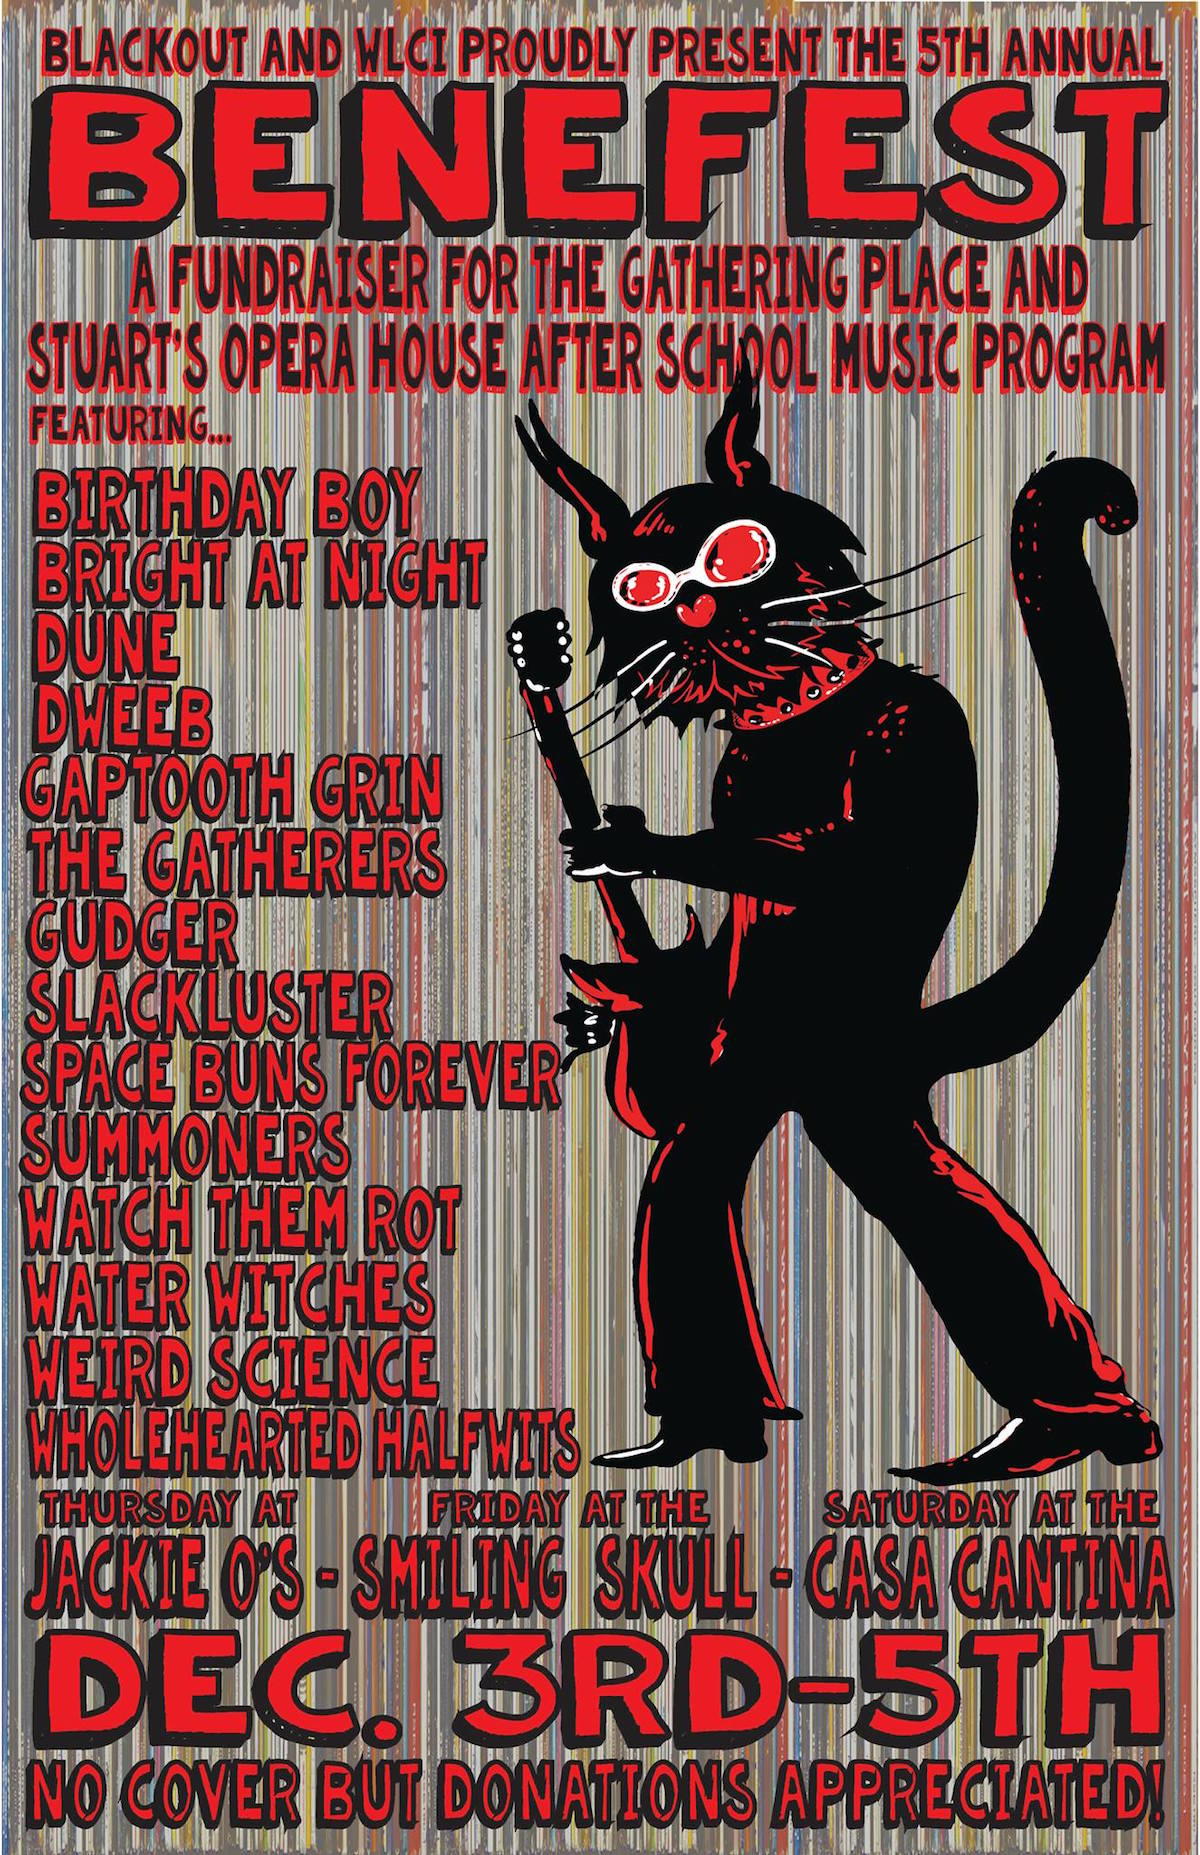 Benefest 2015 poster